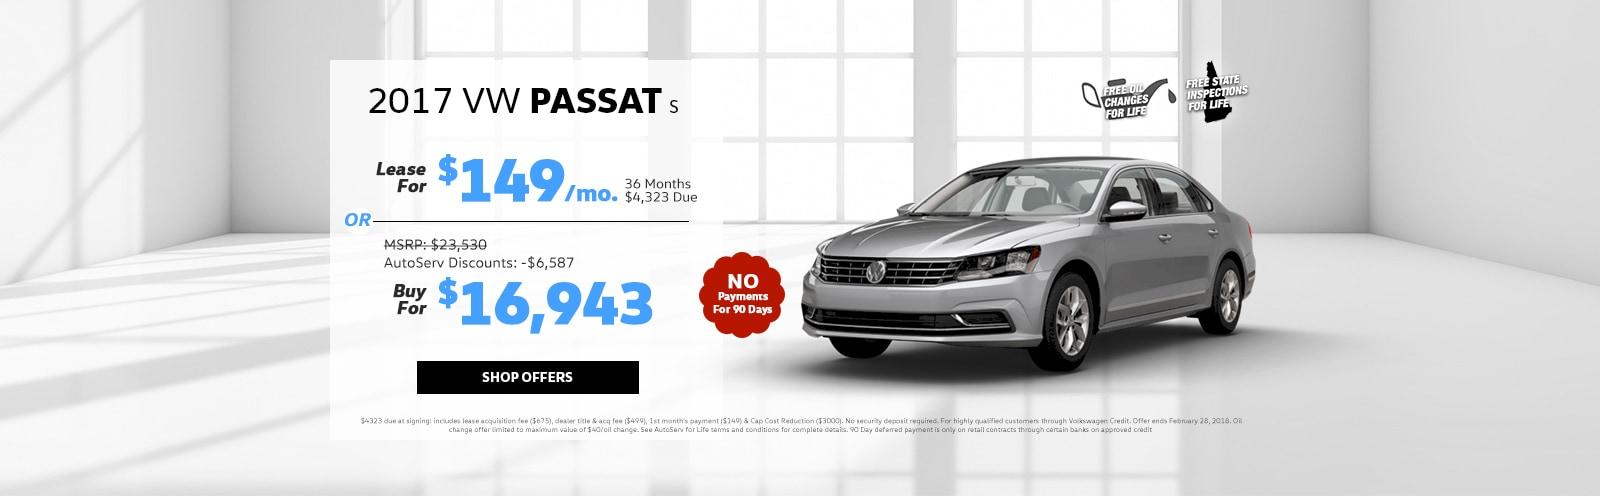 Autoserv Tilton New Hampshire >> AutoServ Volkswagen of Tilton | New Hampshire VW Dealer